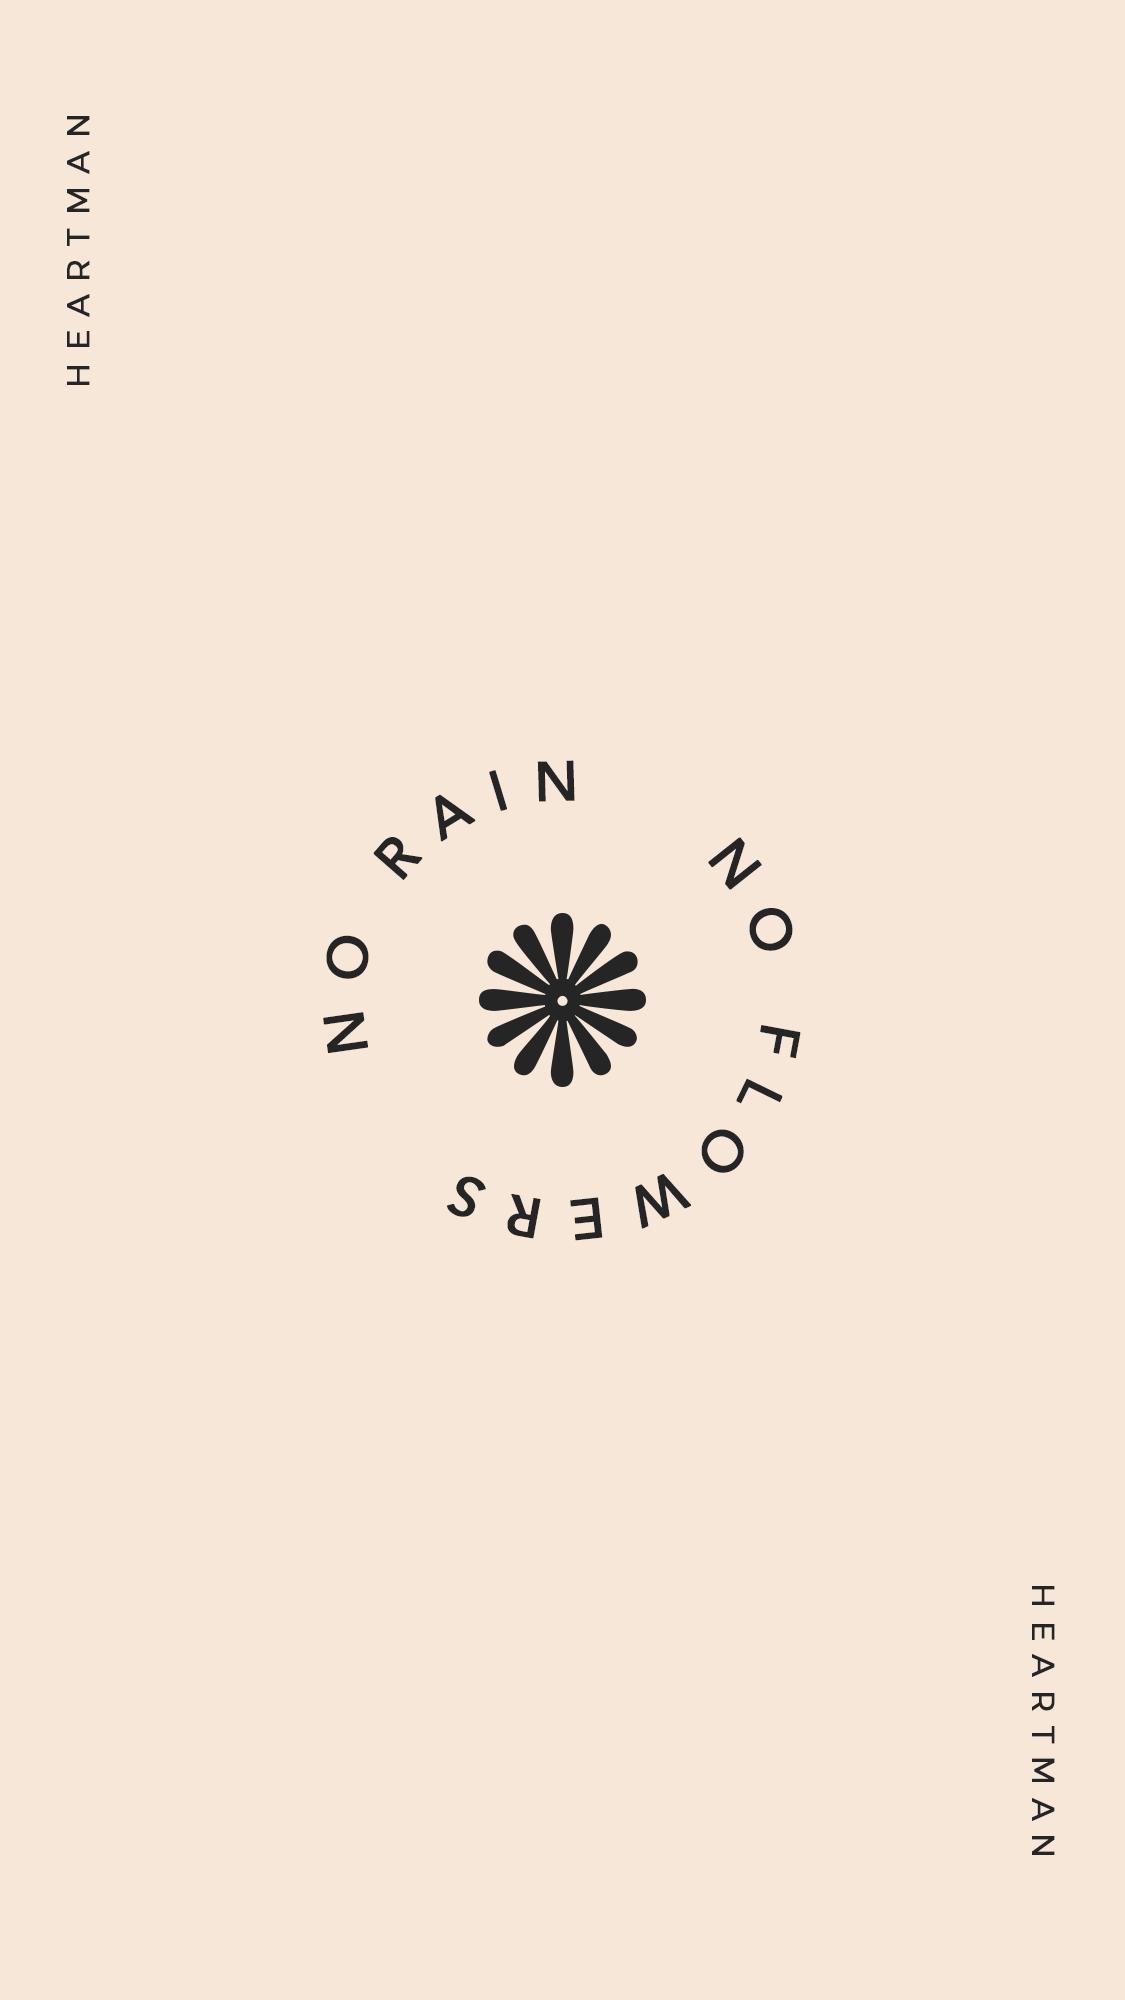 NO-rain2.jpg